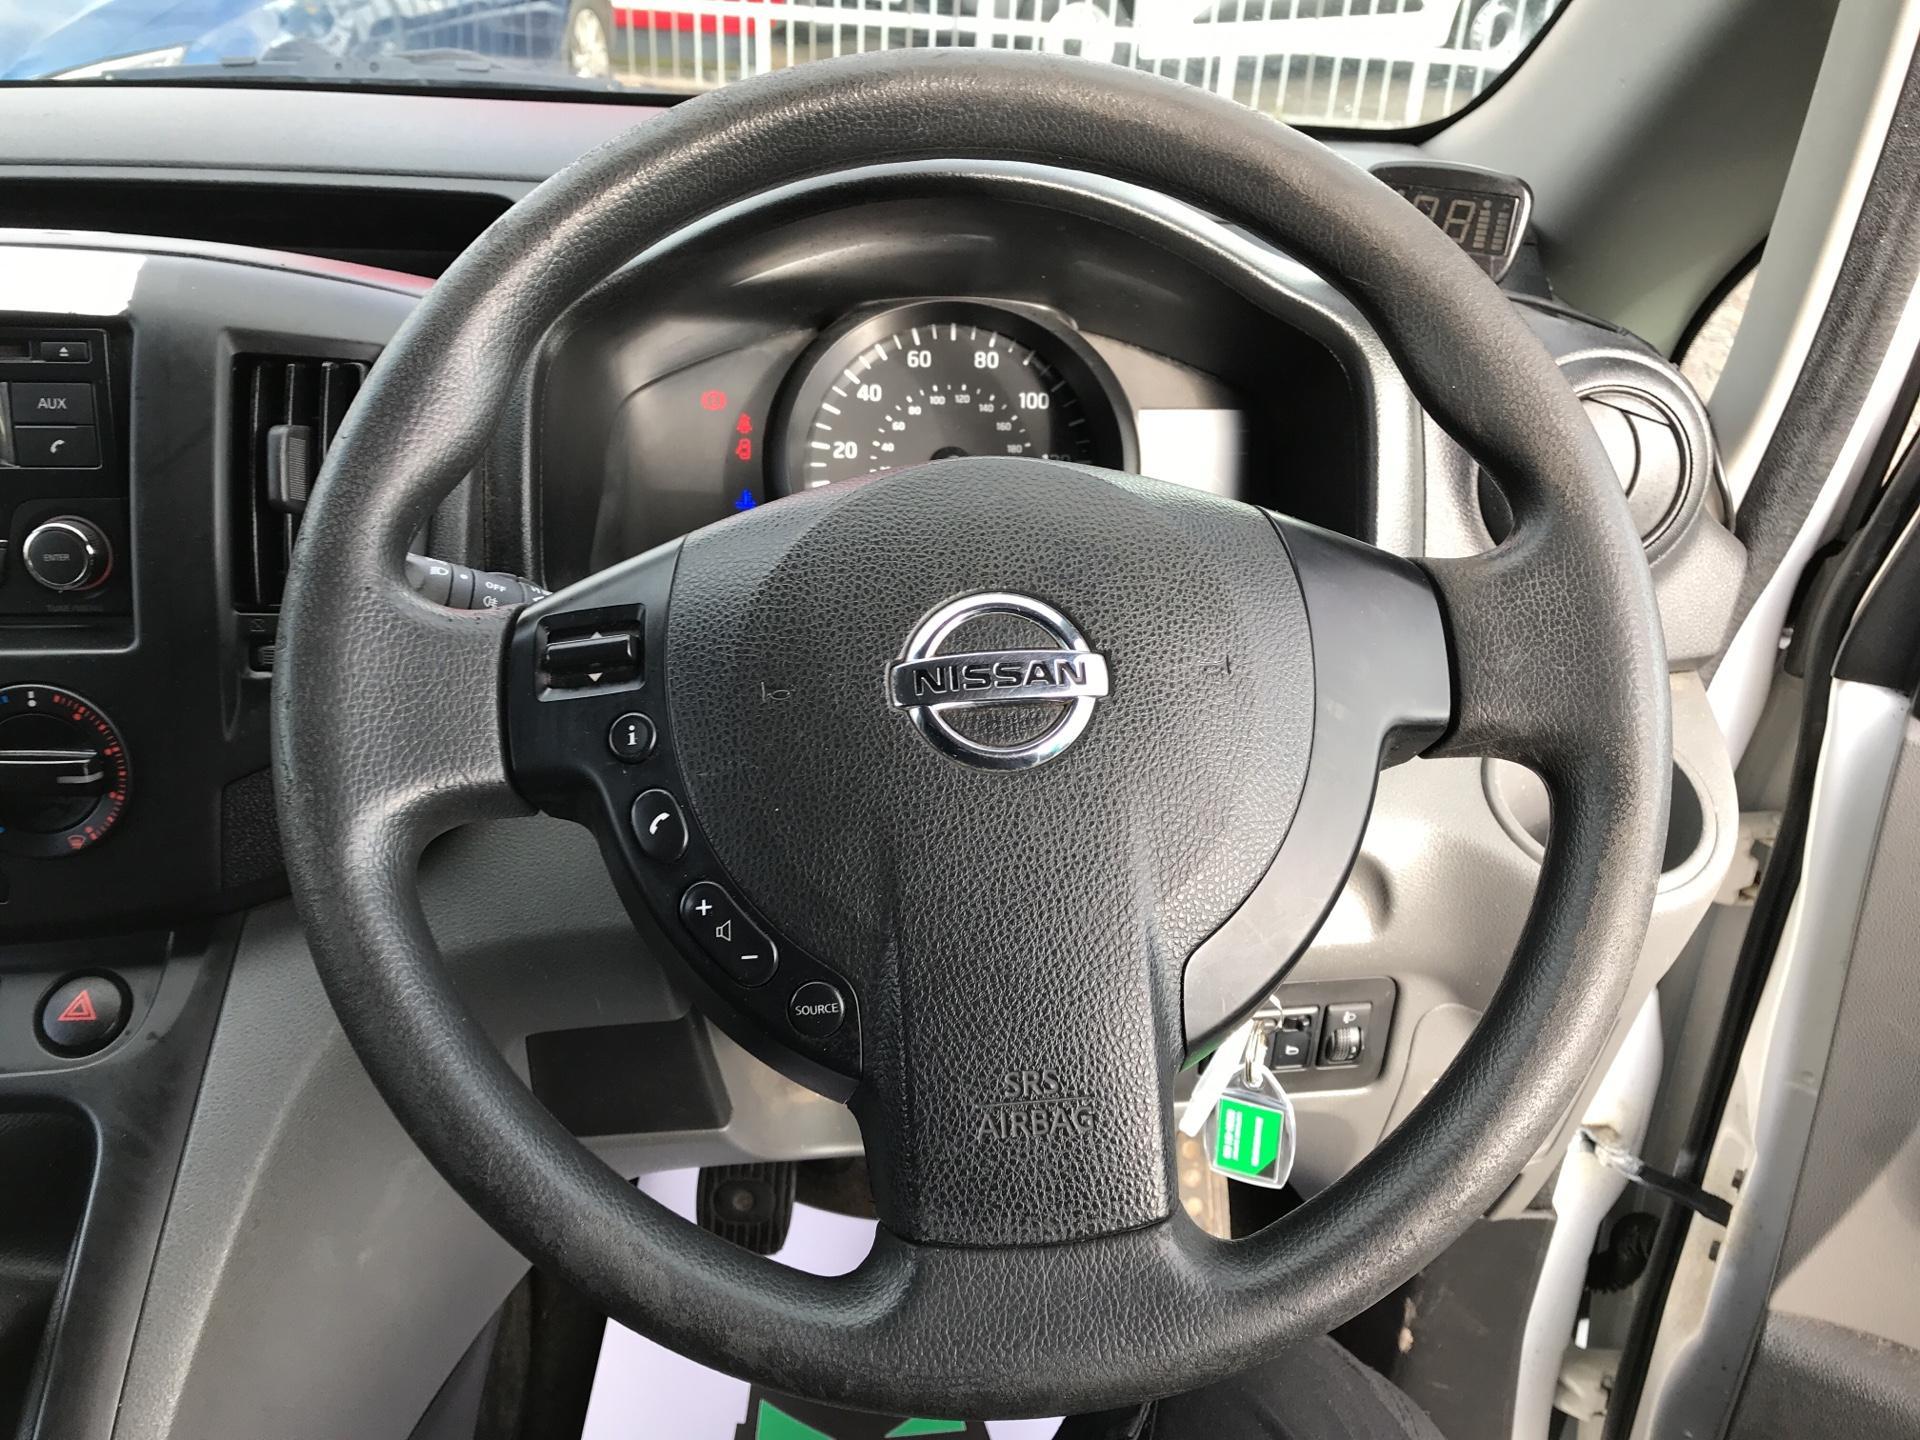 2013 Nissan Nv200 1.5 DCI SE 89BHP VAN EURO 5 (SJ13OUC) Image 12